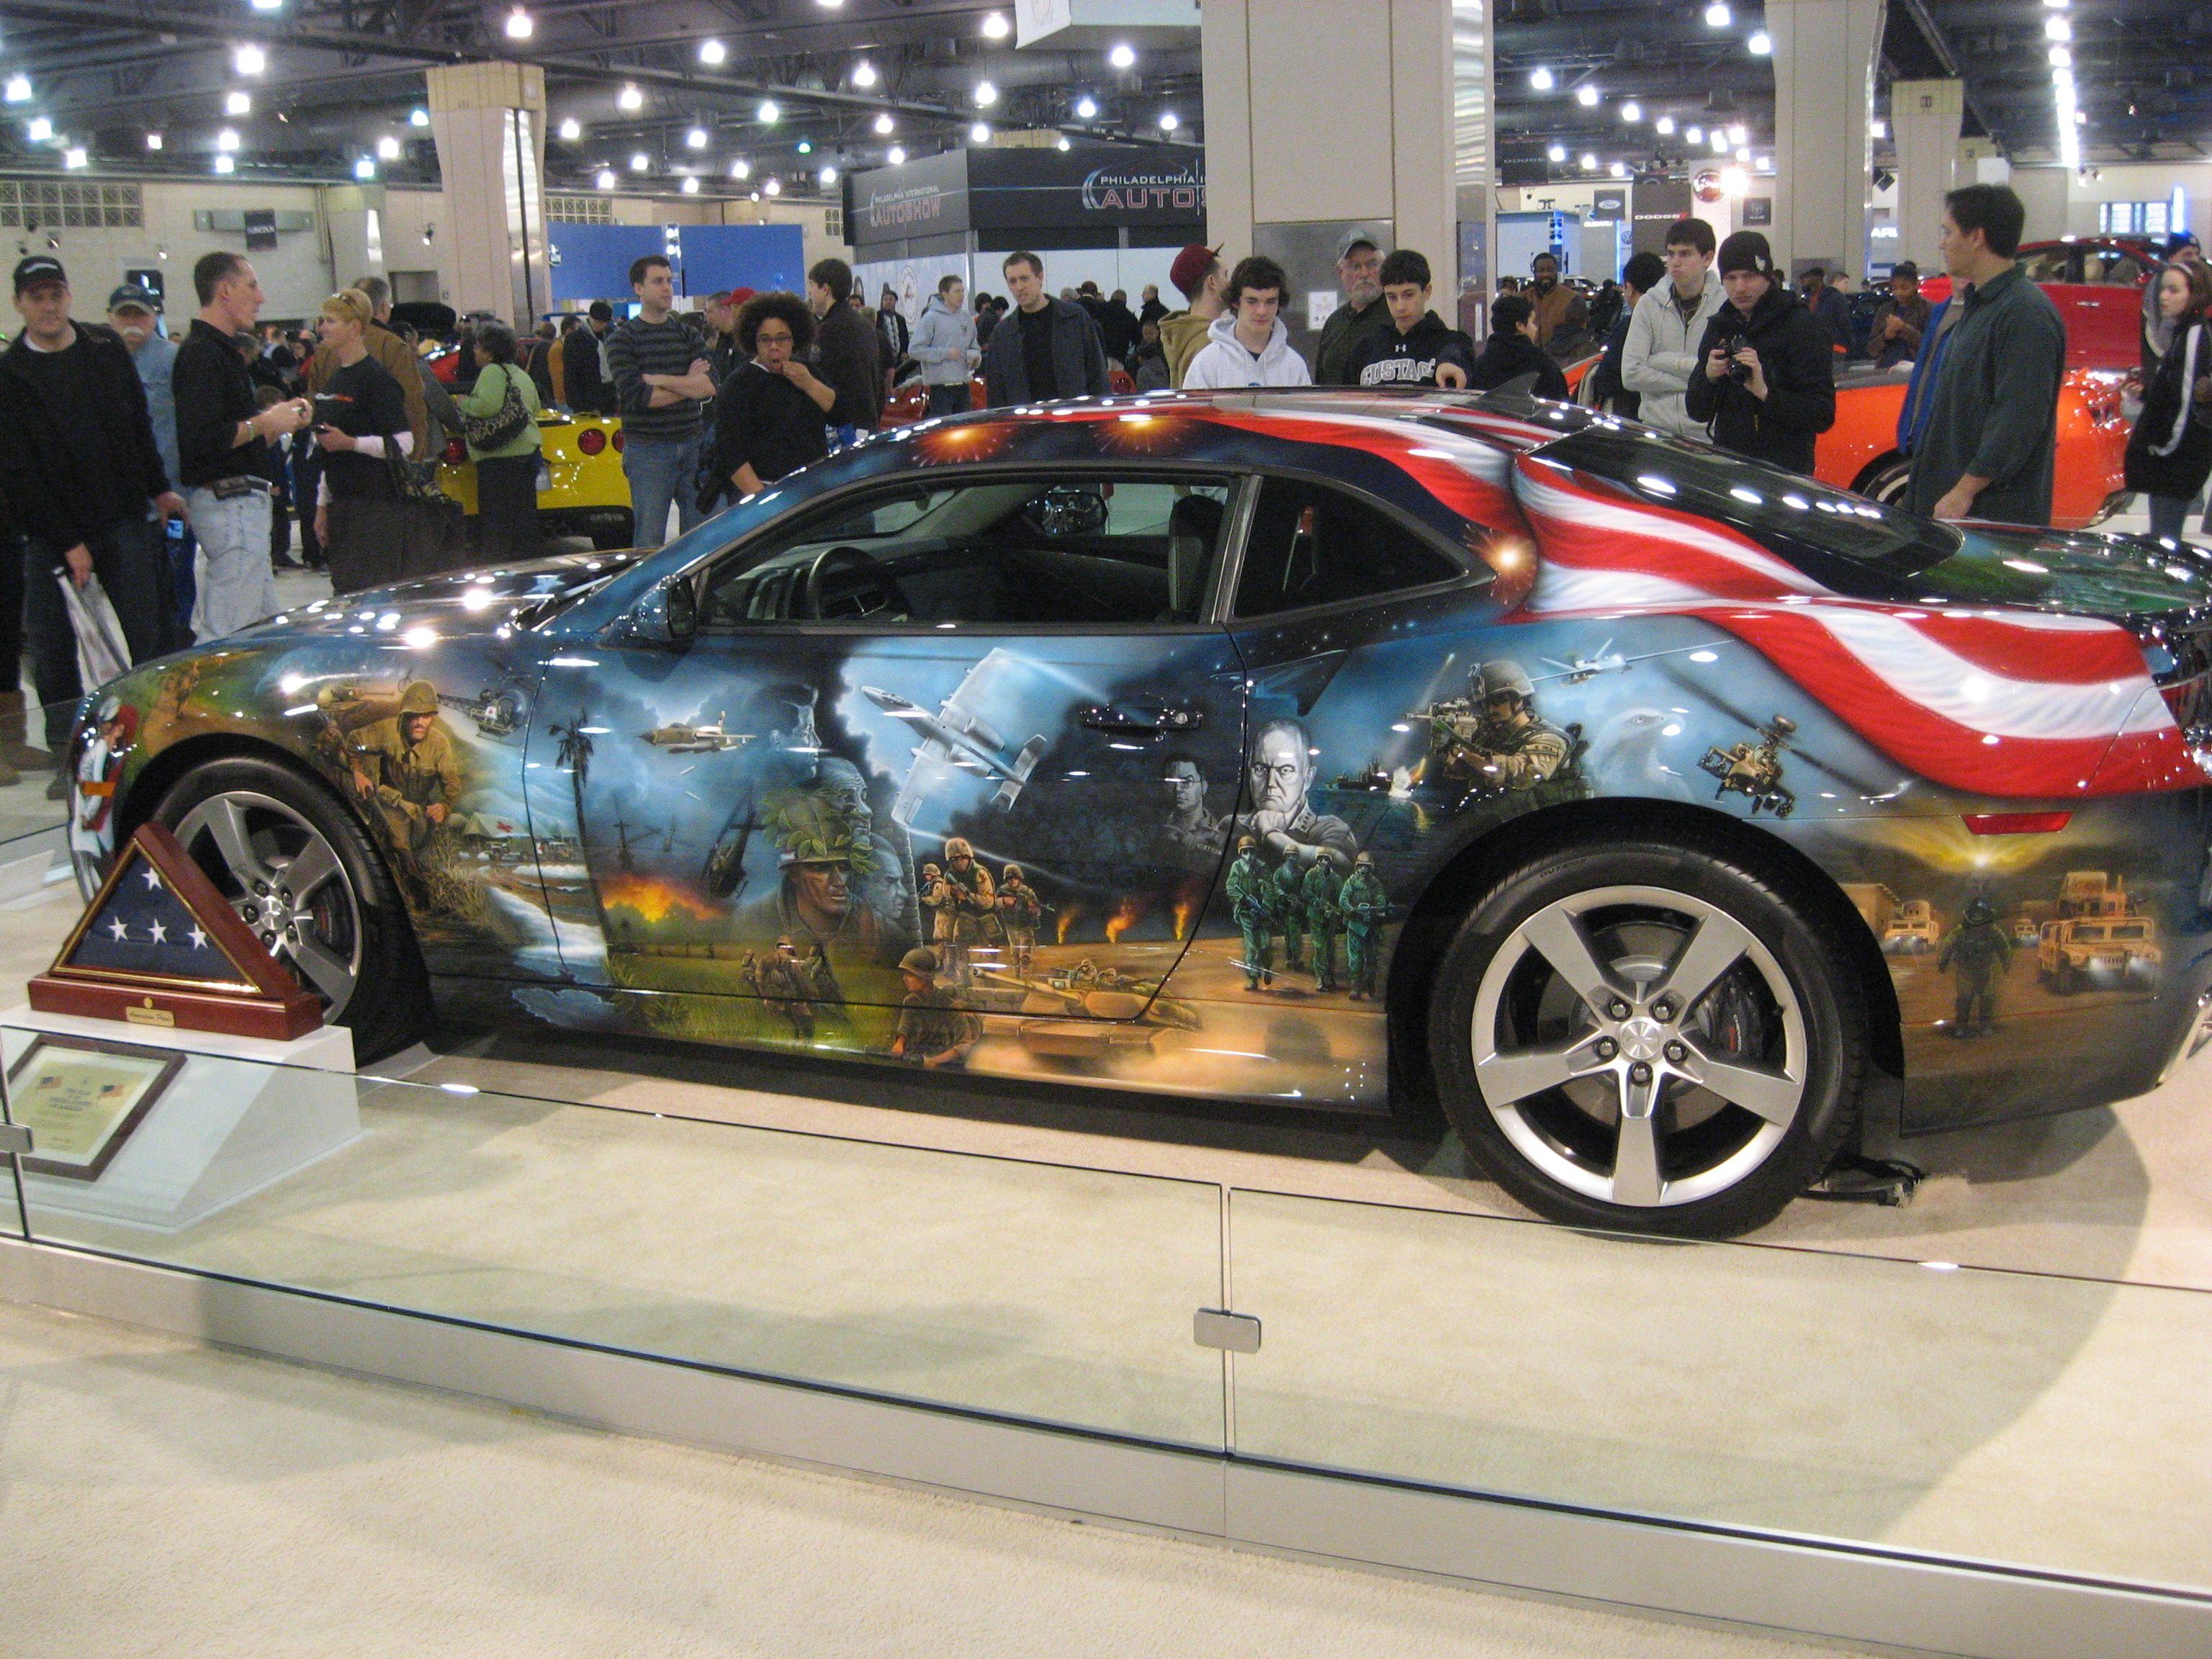 American Pride | American pride, Car painting, American